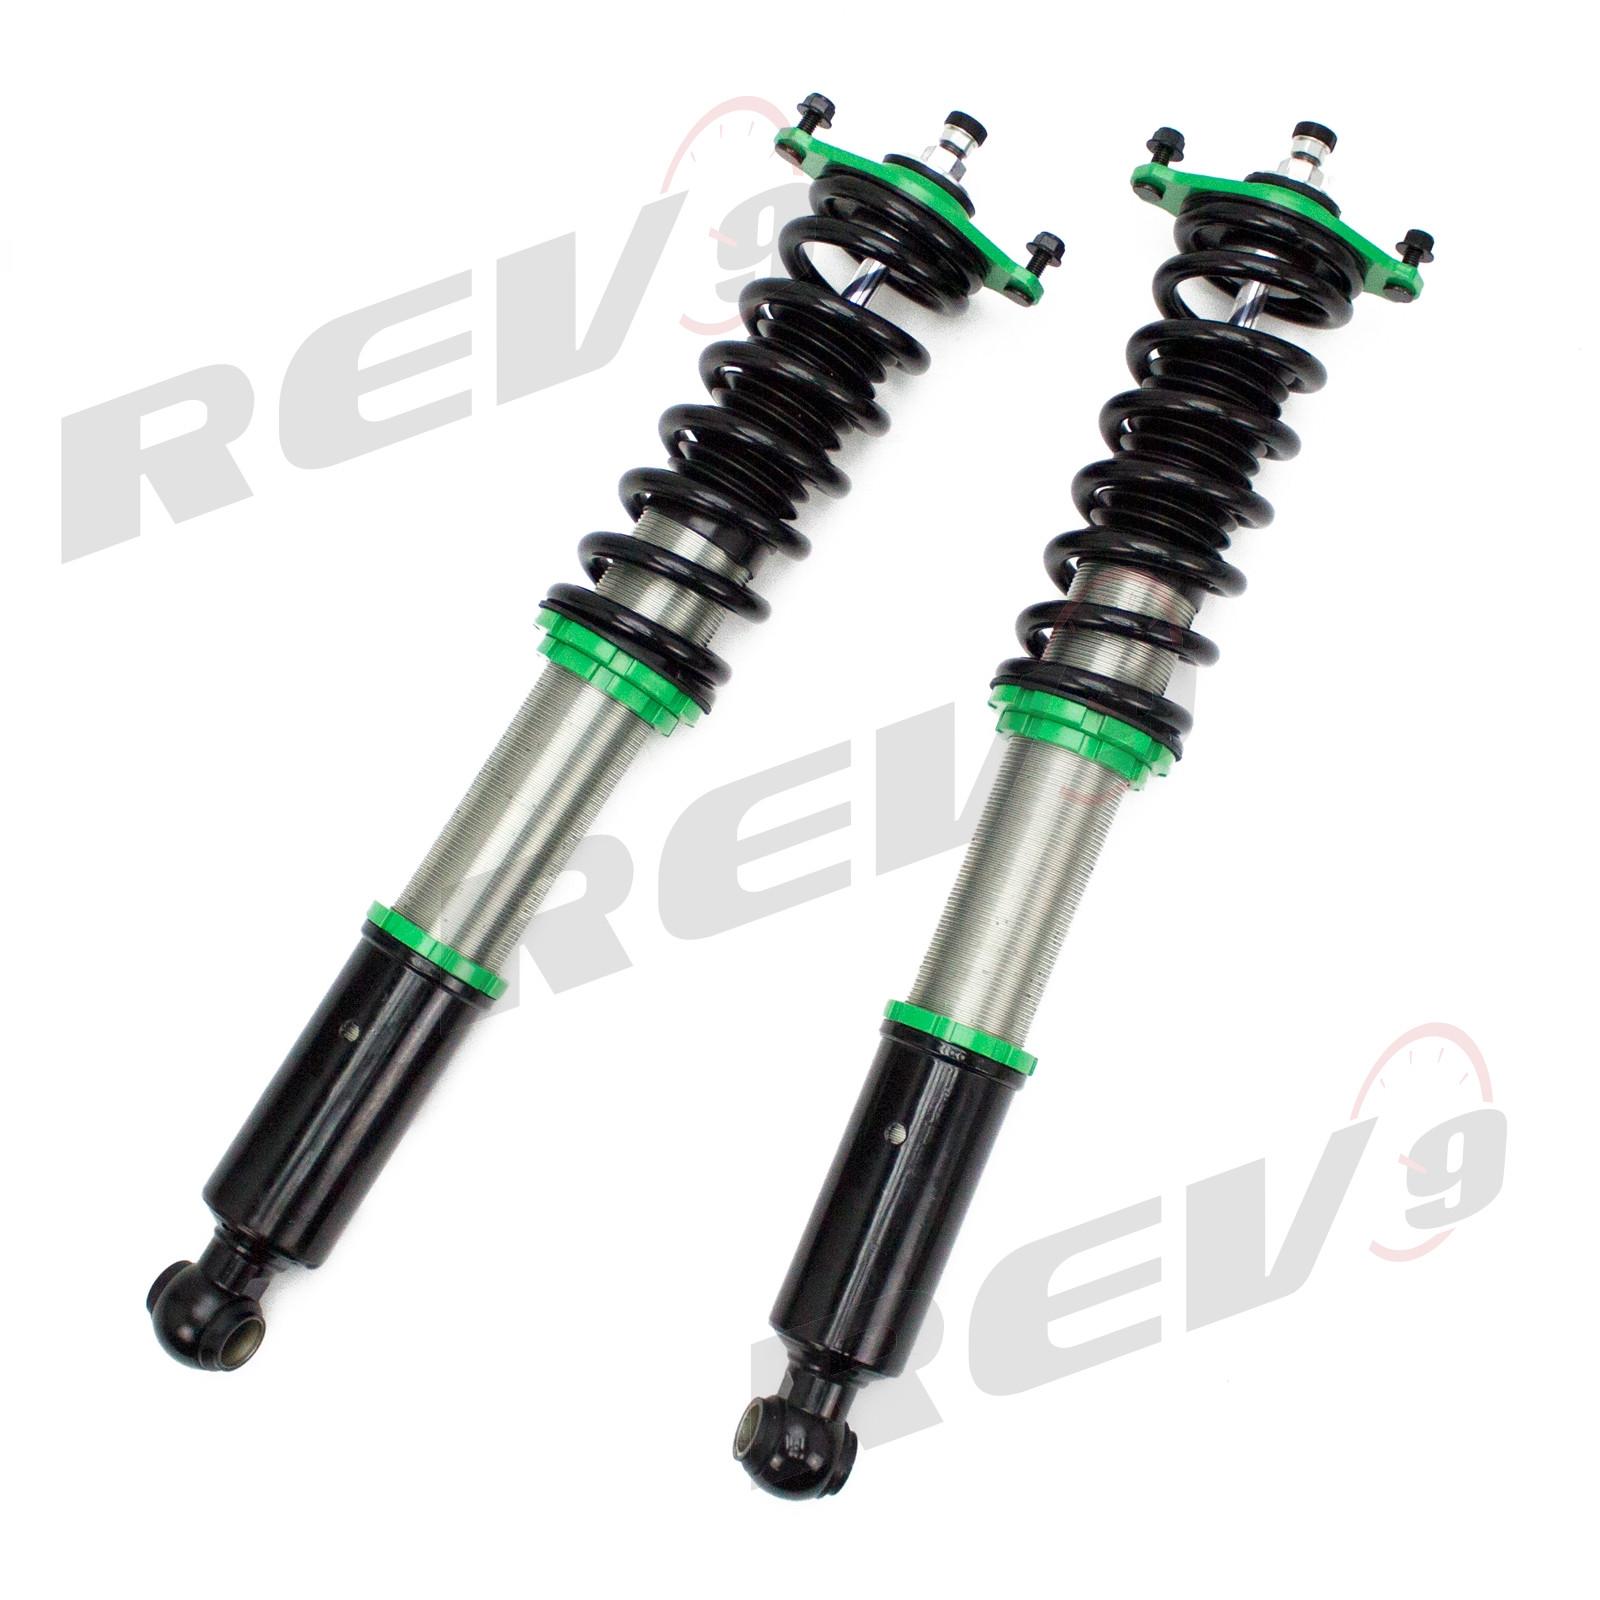 Rev9power Hyper Street 2 Coilover Dampers Nissan 240sx